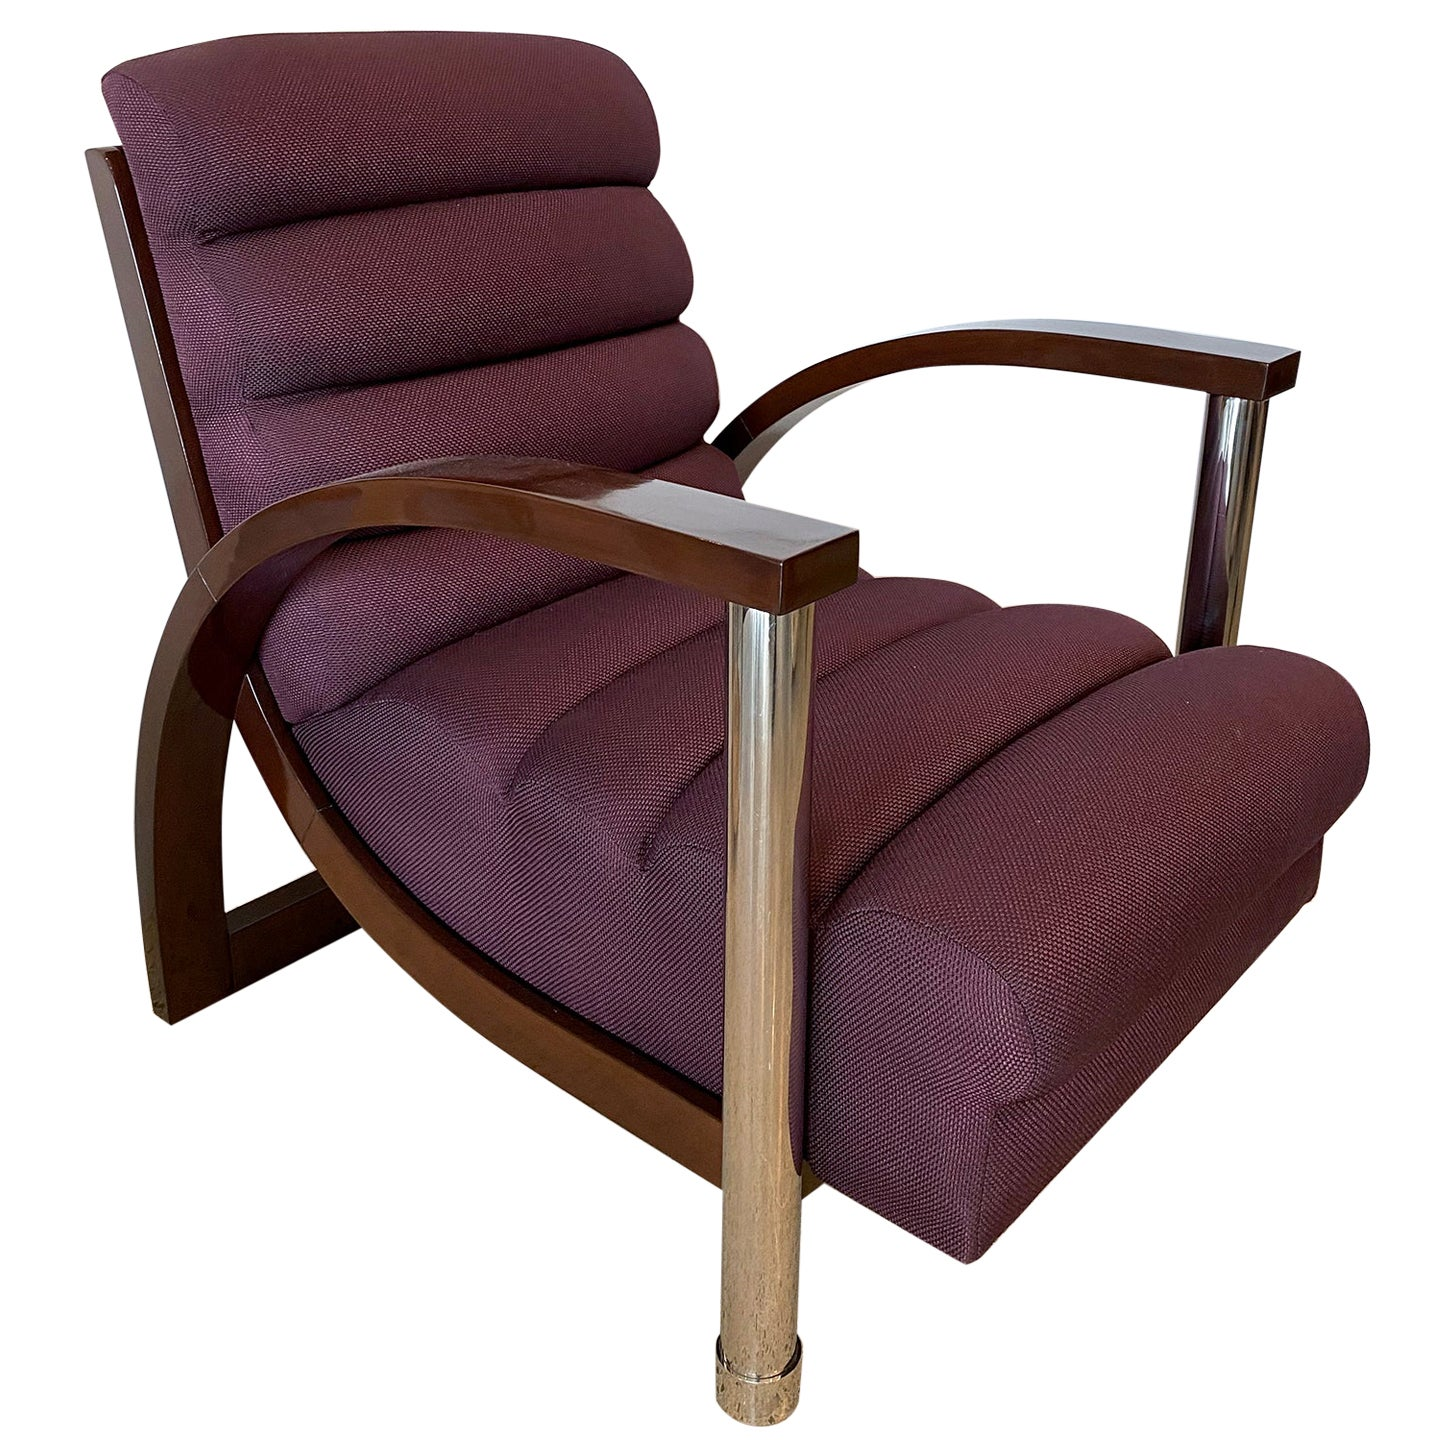 American Modern Dark Oak and Chrome Eclipse Chair Jay Spectre Channeled Upholste